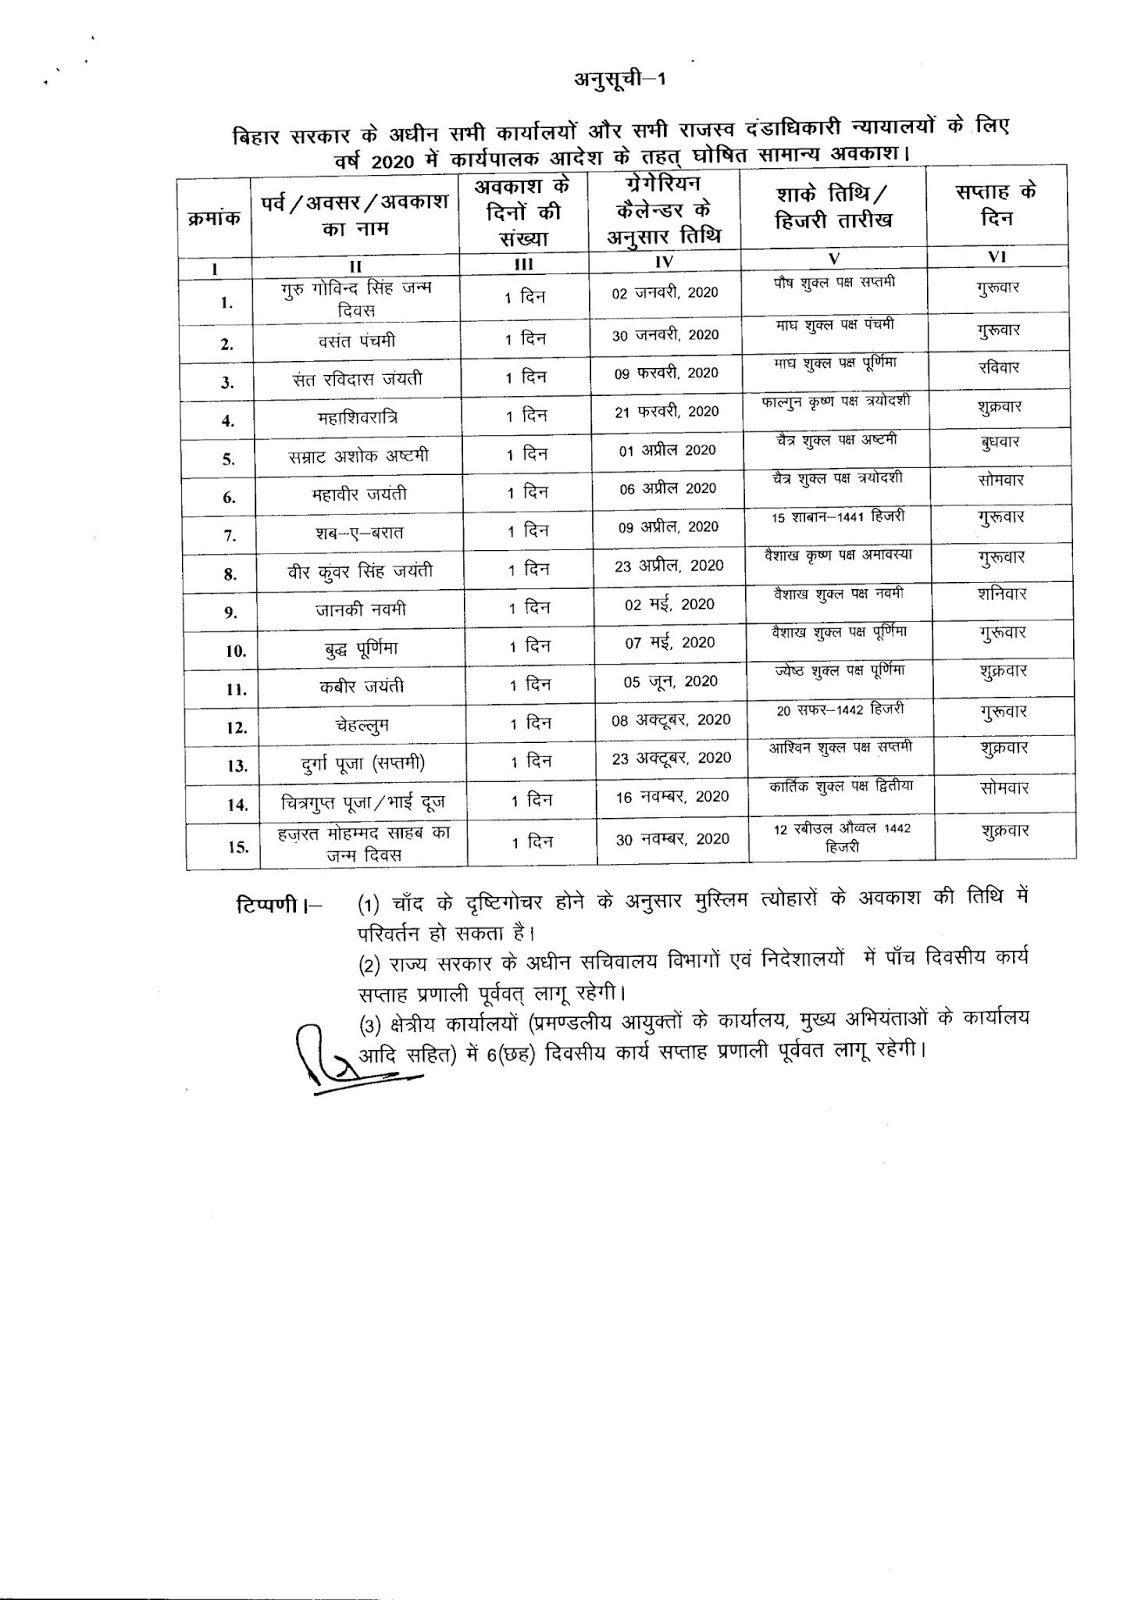 Bihar Government Calendar 2020 #educratsweb within Download Bihar Sarkar Calendar 2020